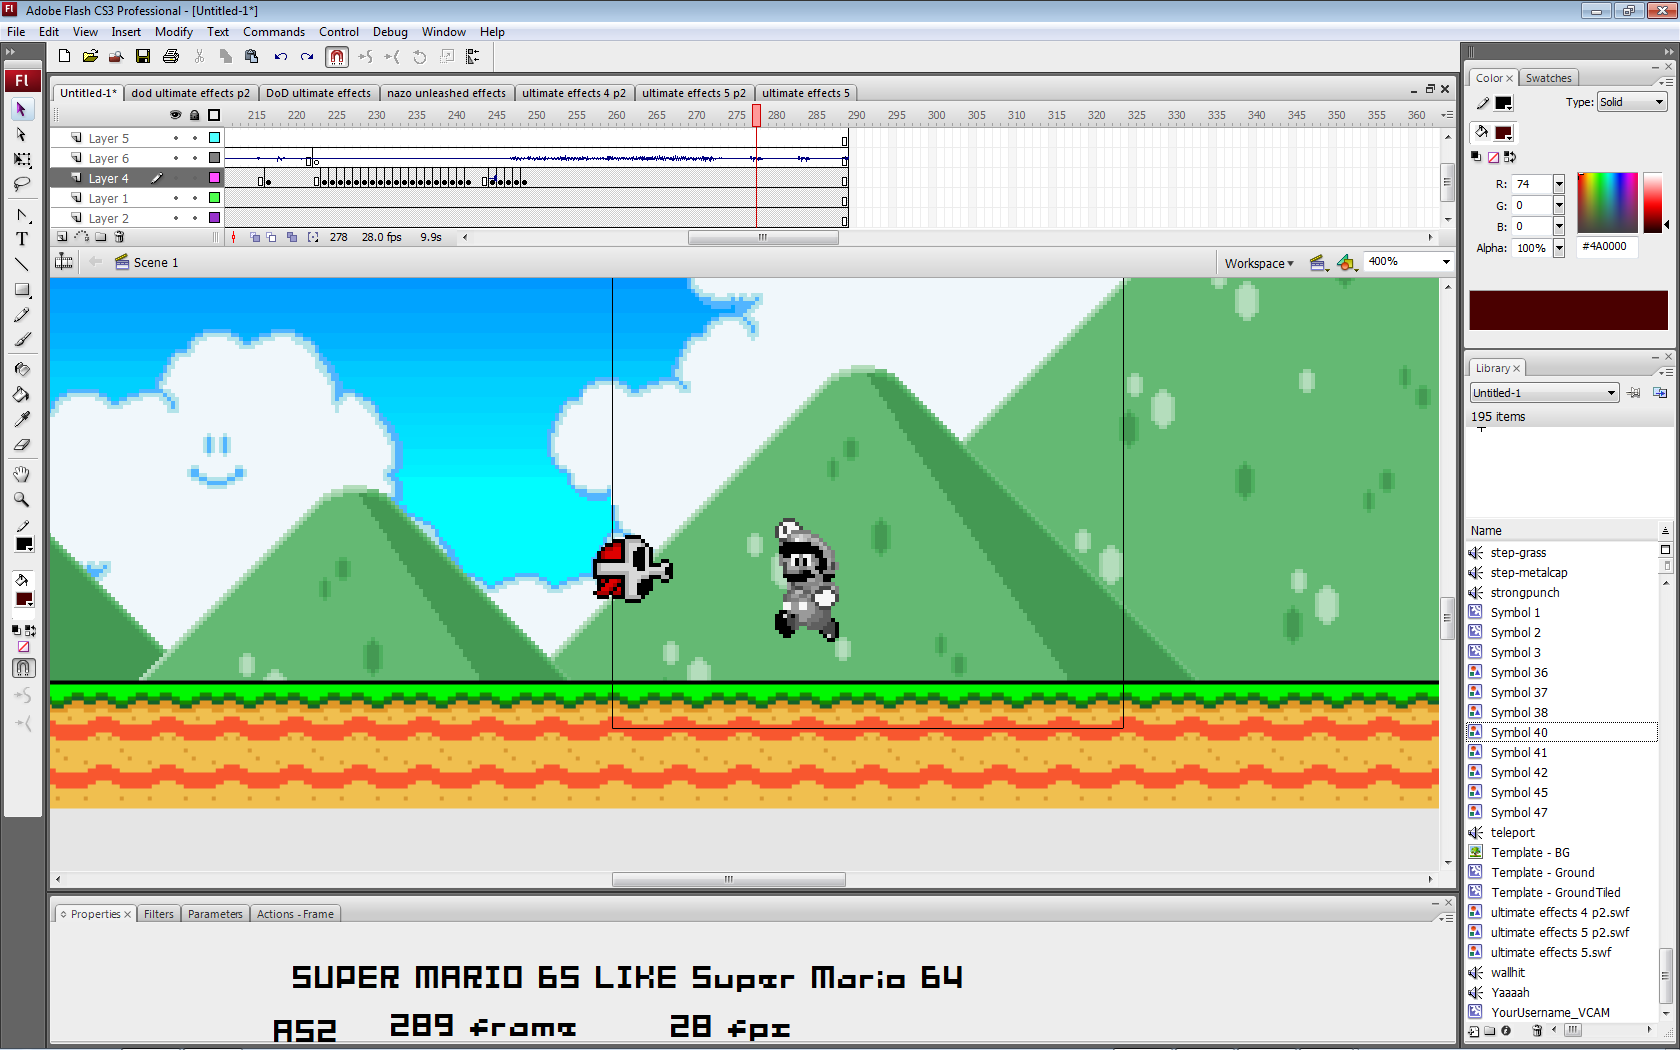 Super Mario 65? Weeeee10